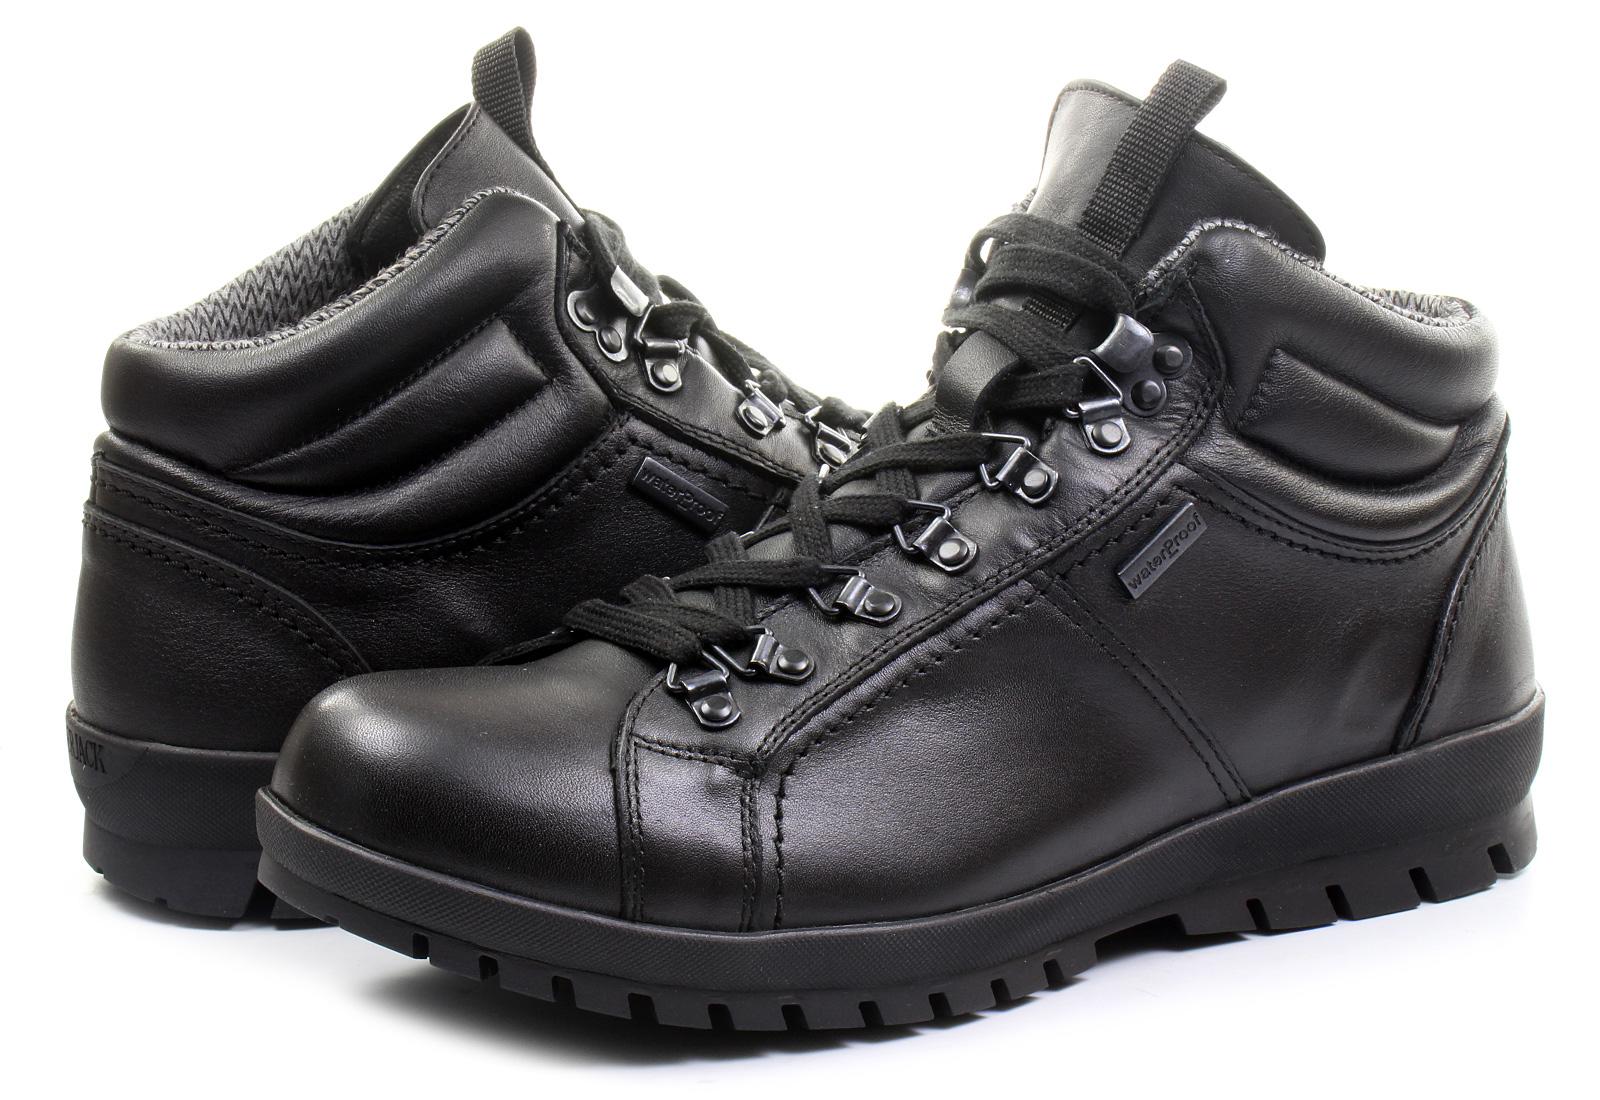 Lumberjack Shoes Zermatt Wp Leather M31013 B01 Blk